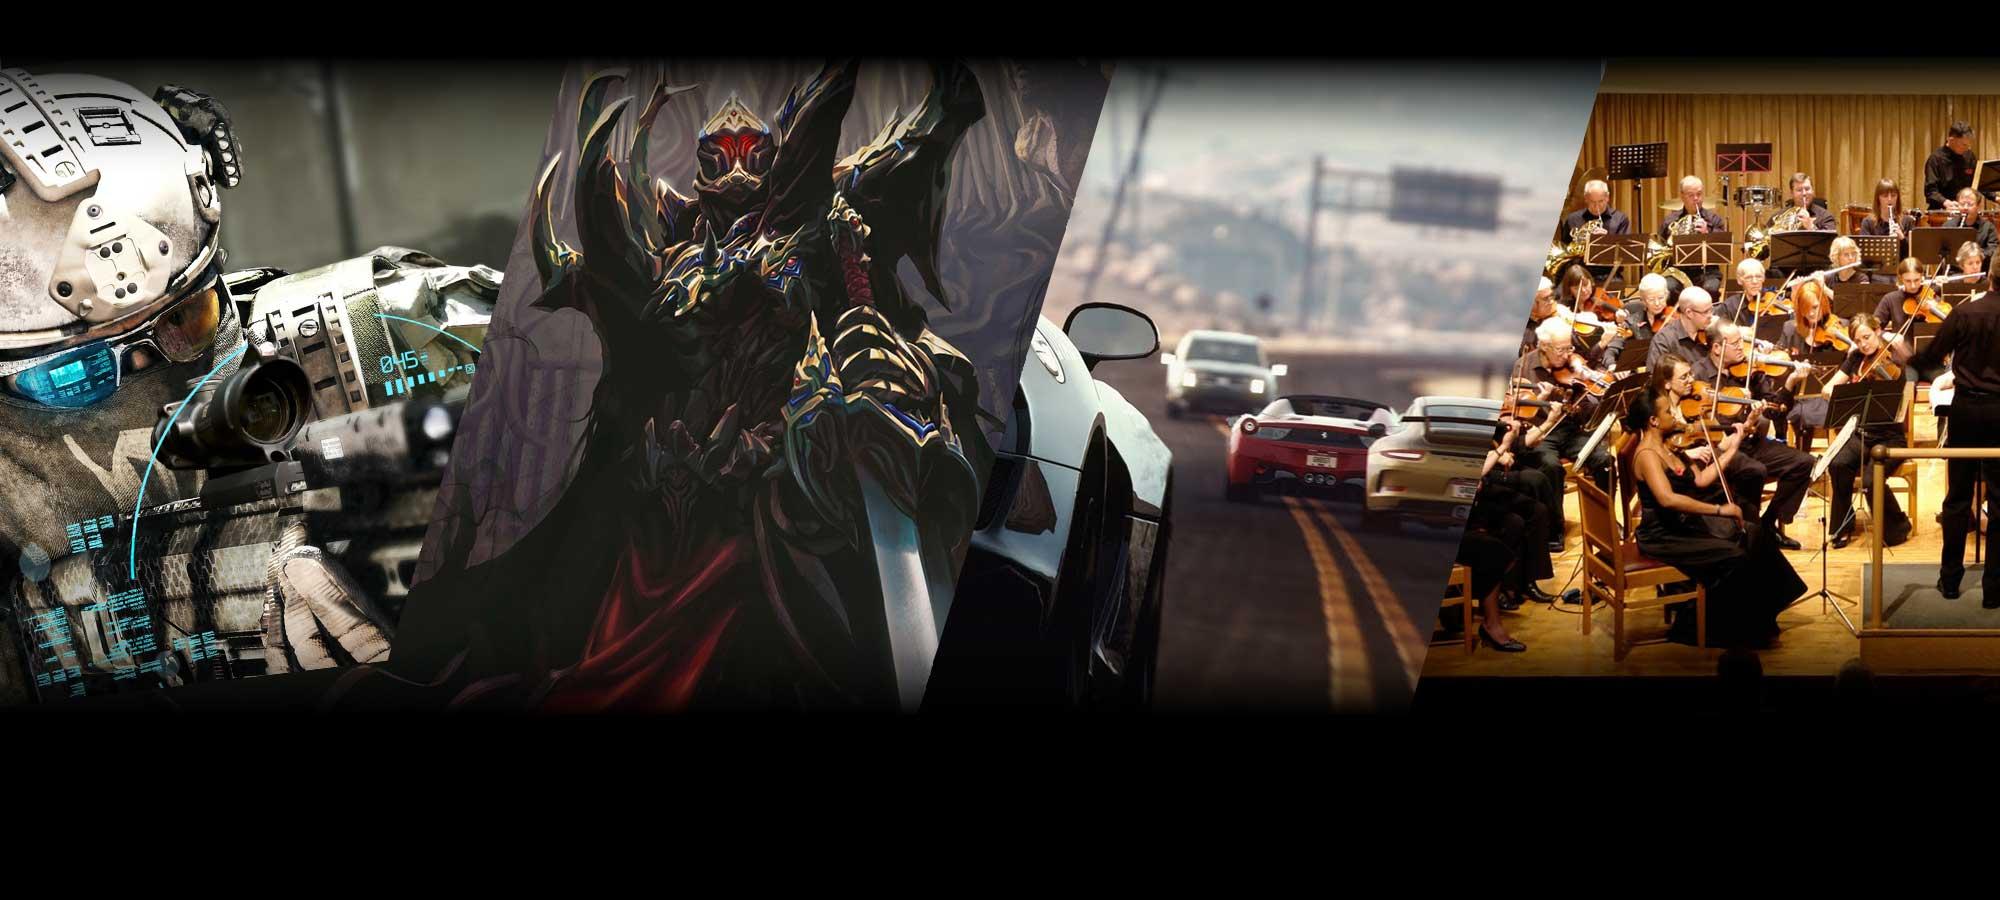 Banner-Video-Game-Soundtracks-Landing-Page-LmK-Music